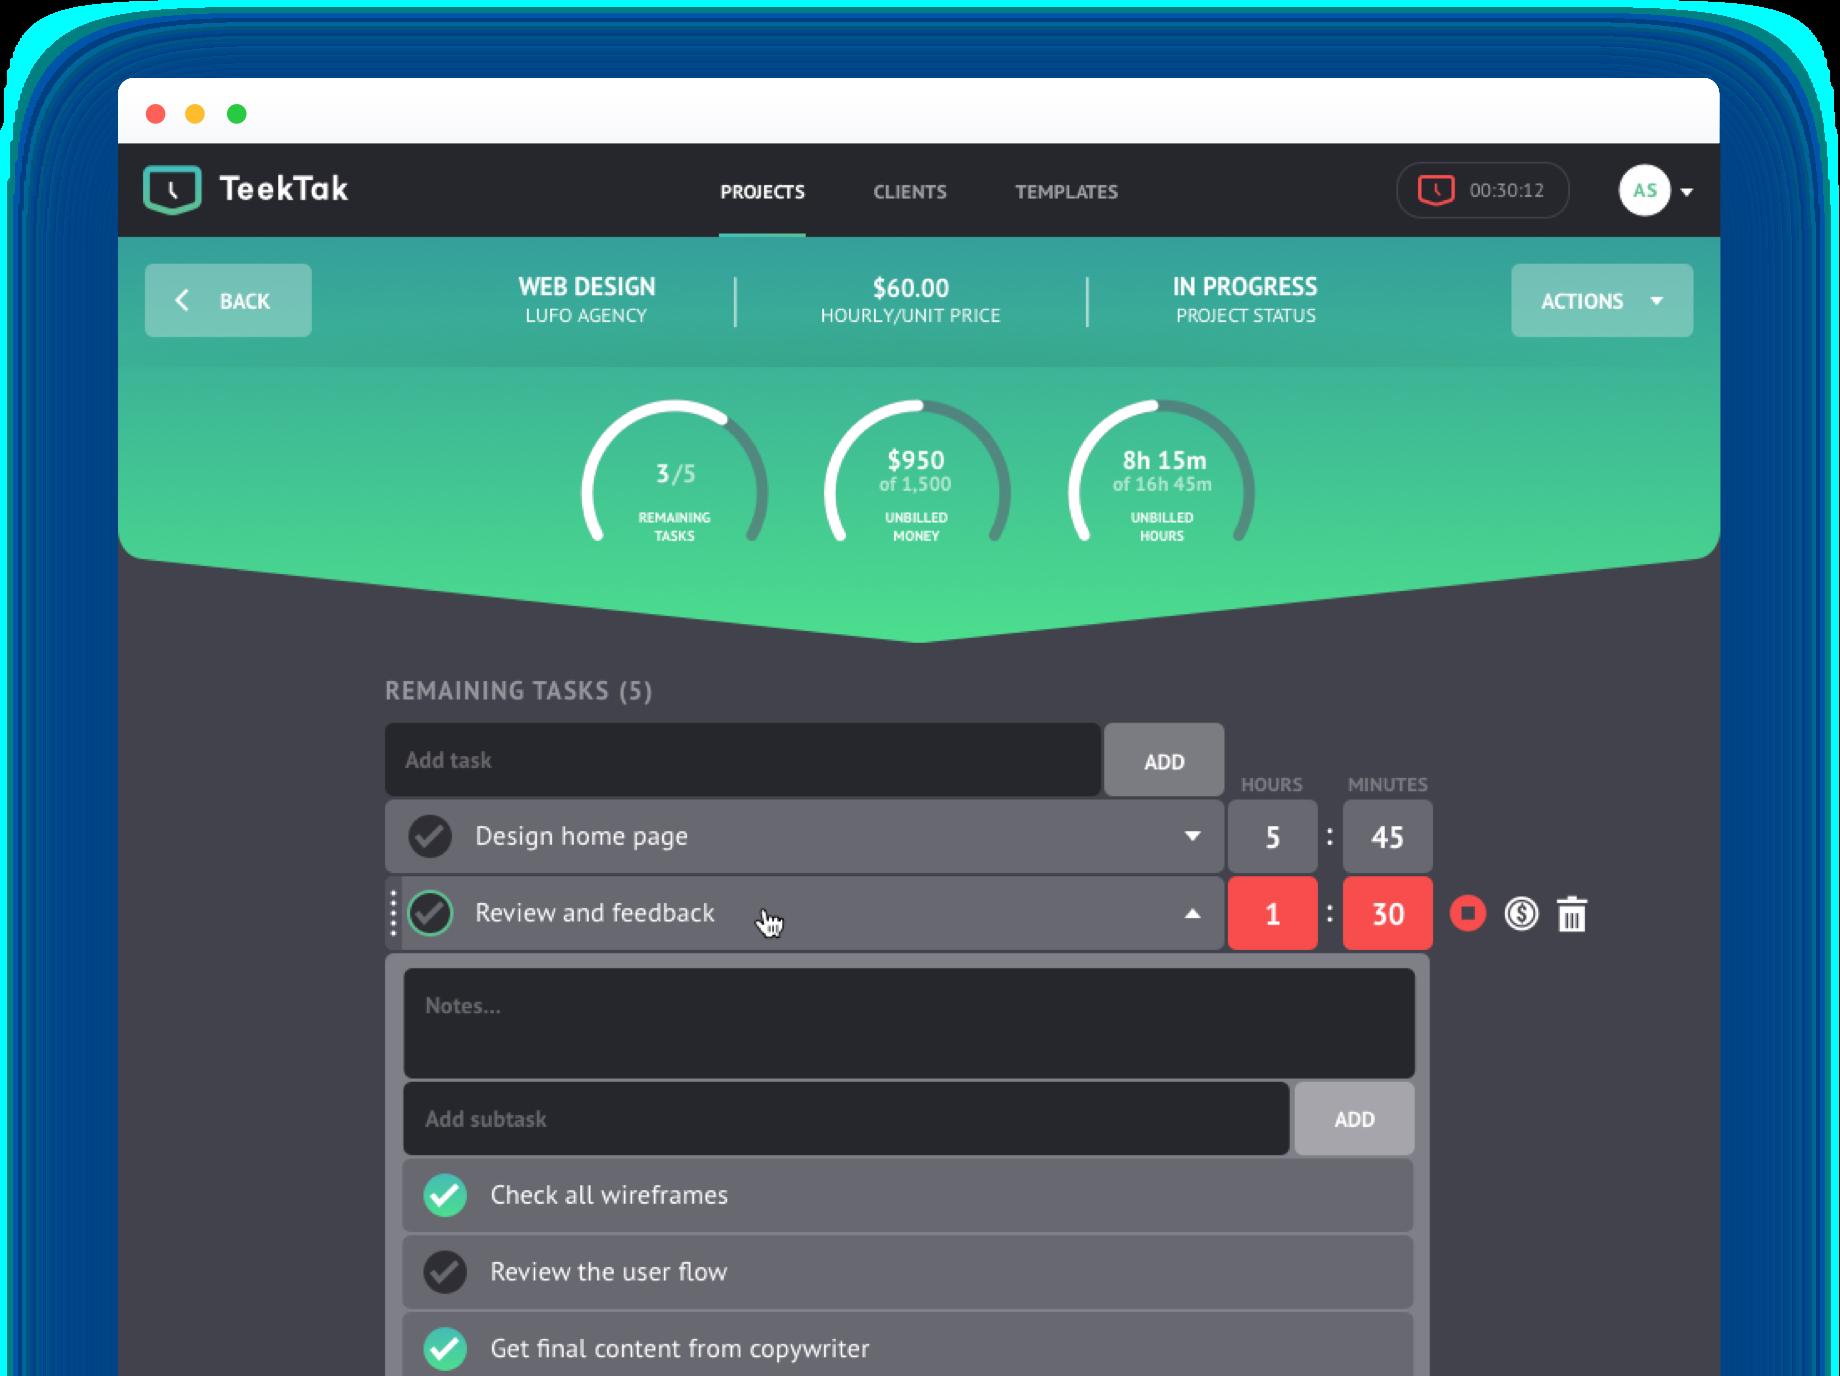 Photo of TeekTak main screen interface